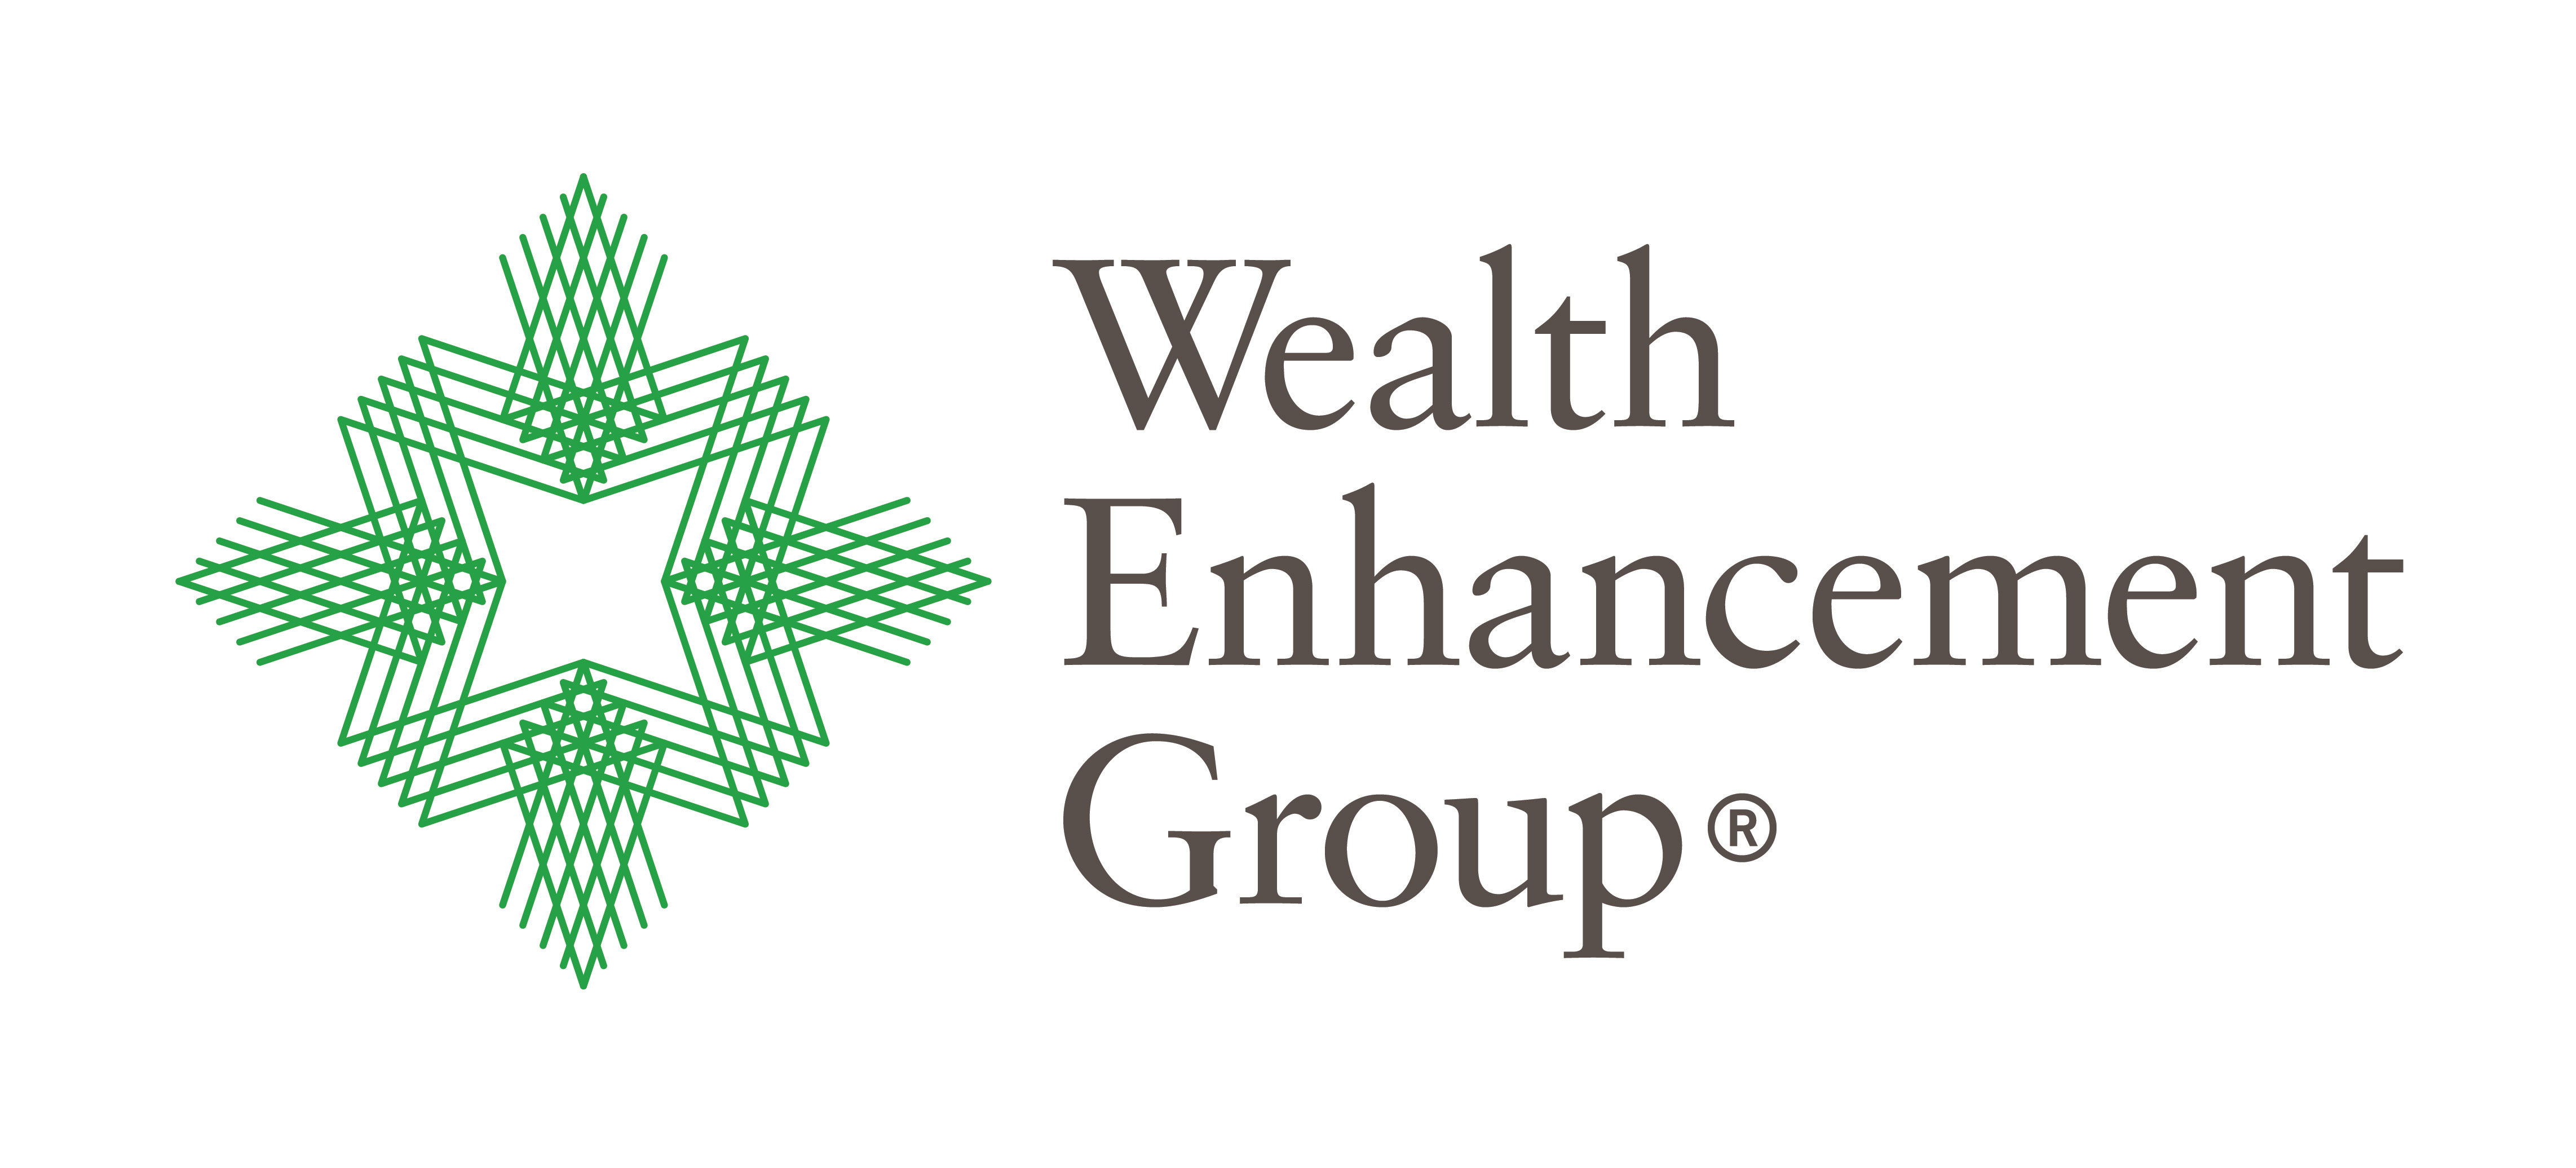 Wealth Enhancement Group Announces Acquisition by Leading Global